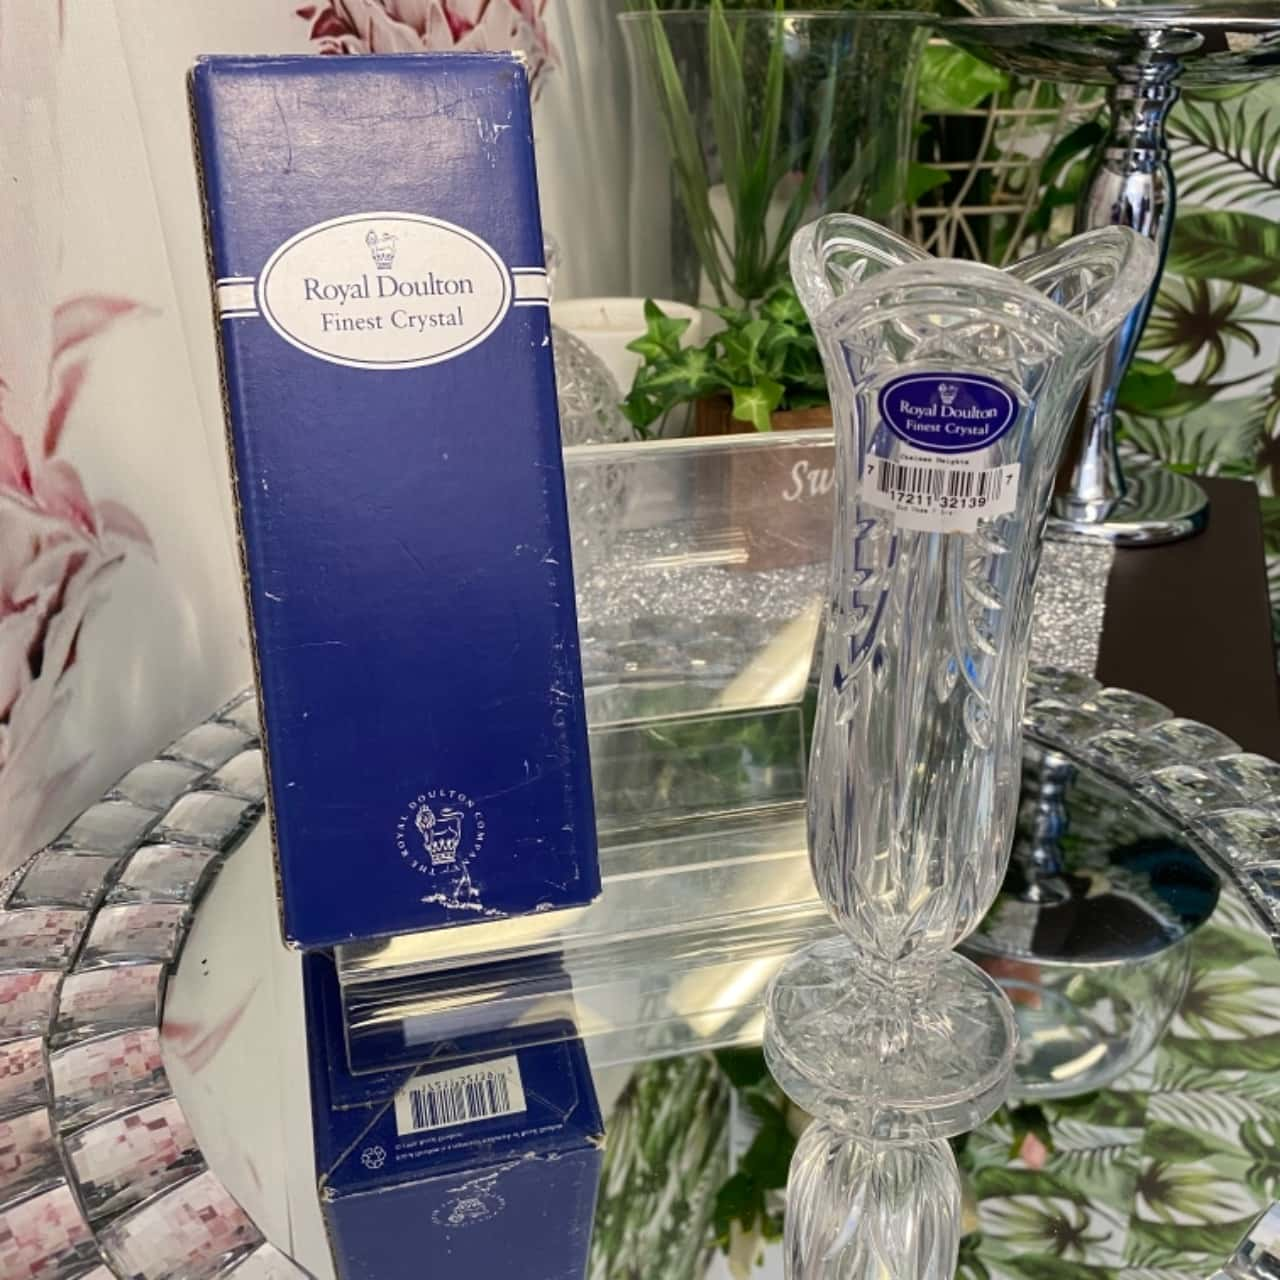 Royal Doulton Crystal Vase